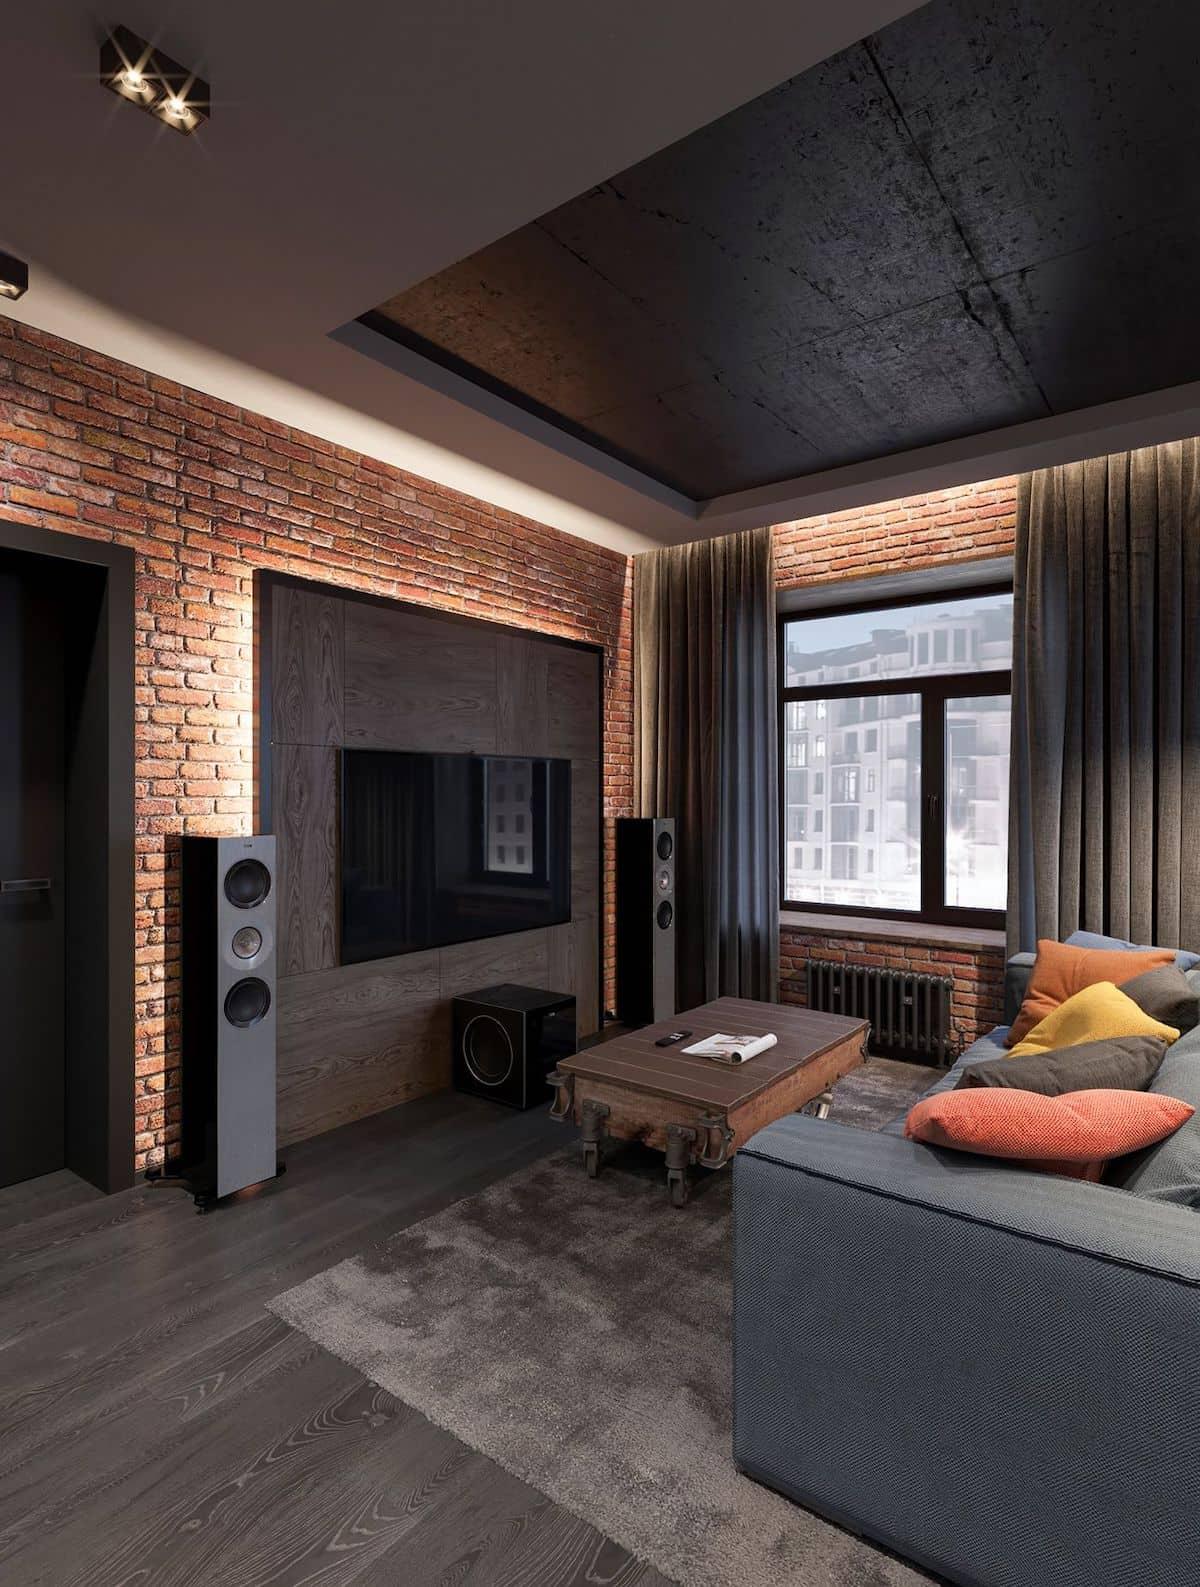 модный дизайн интерьера квартиры фото 42